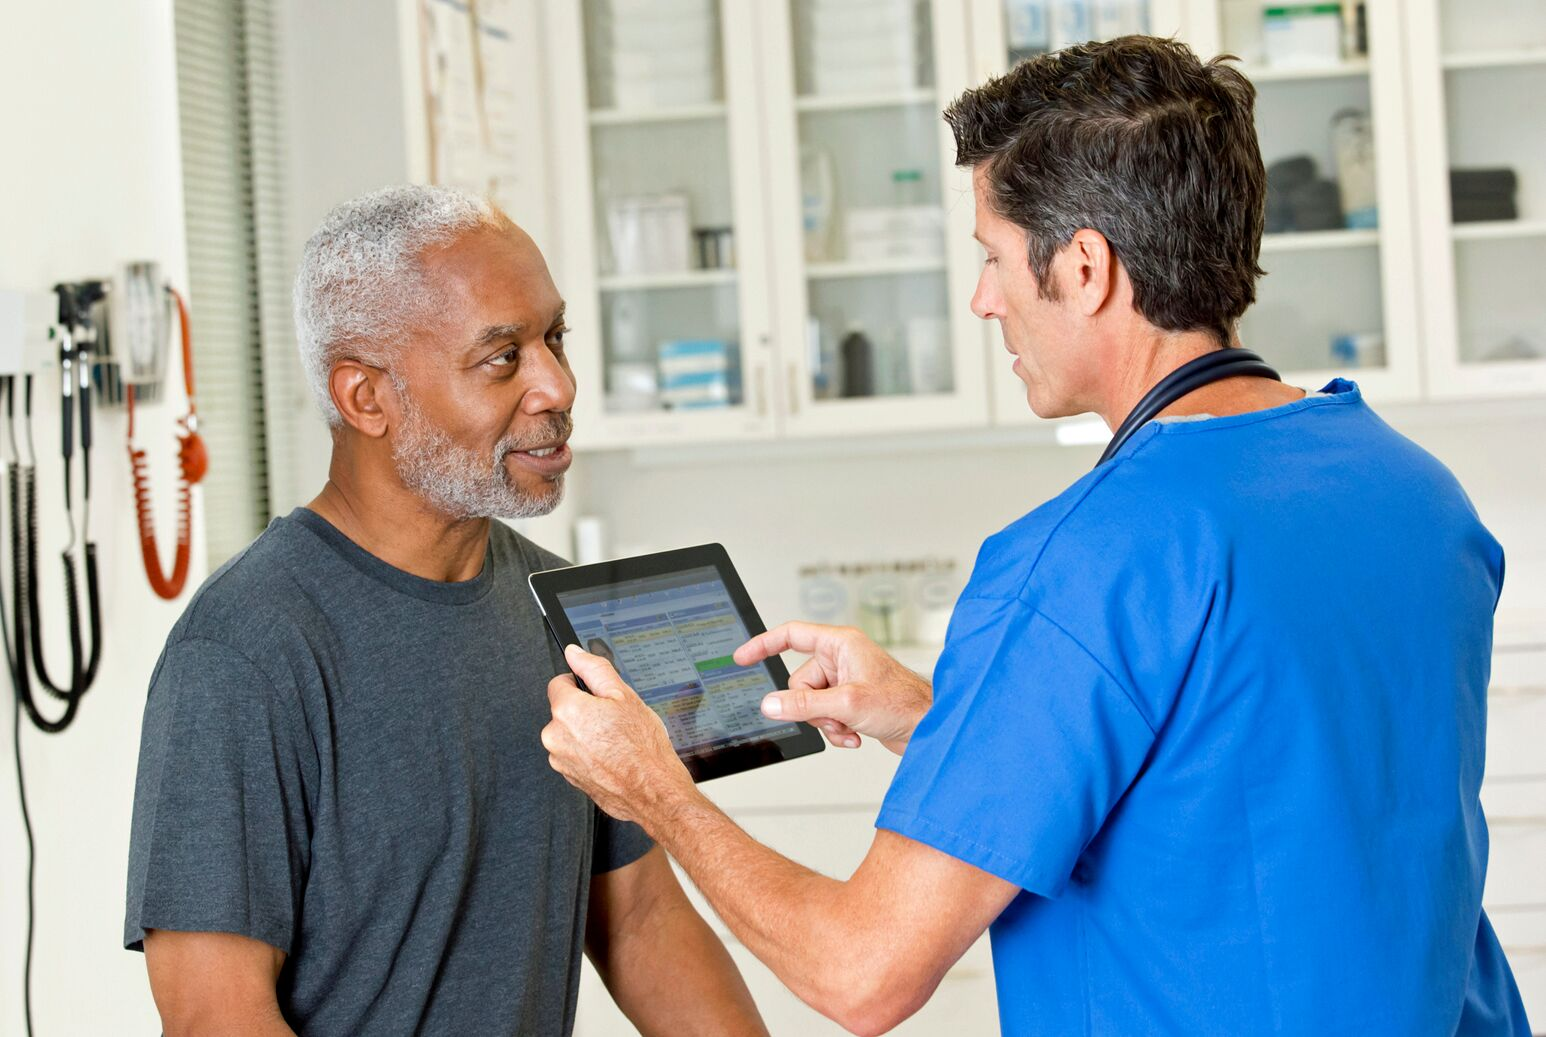 Rethinking Electronic Health Records Northwell Health